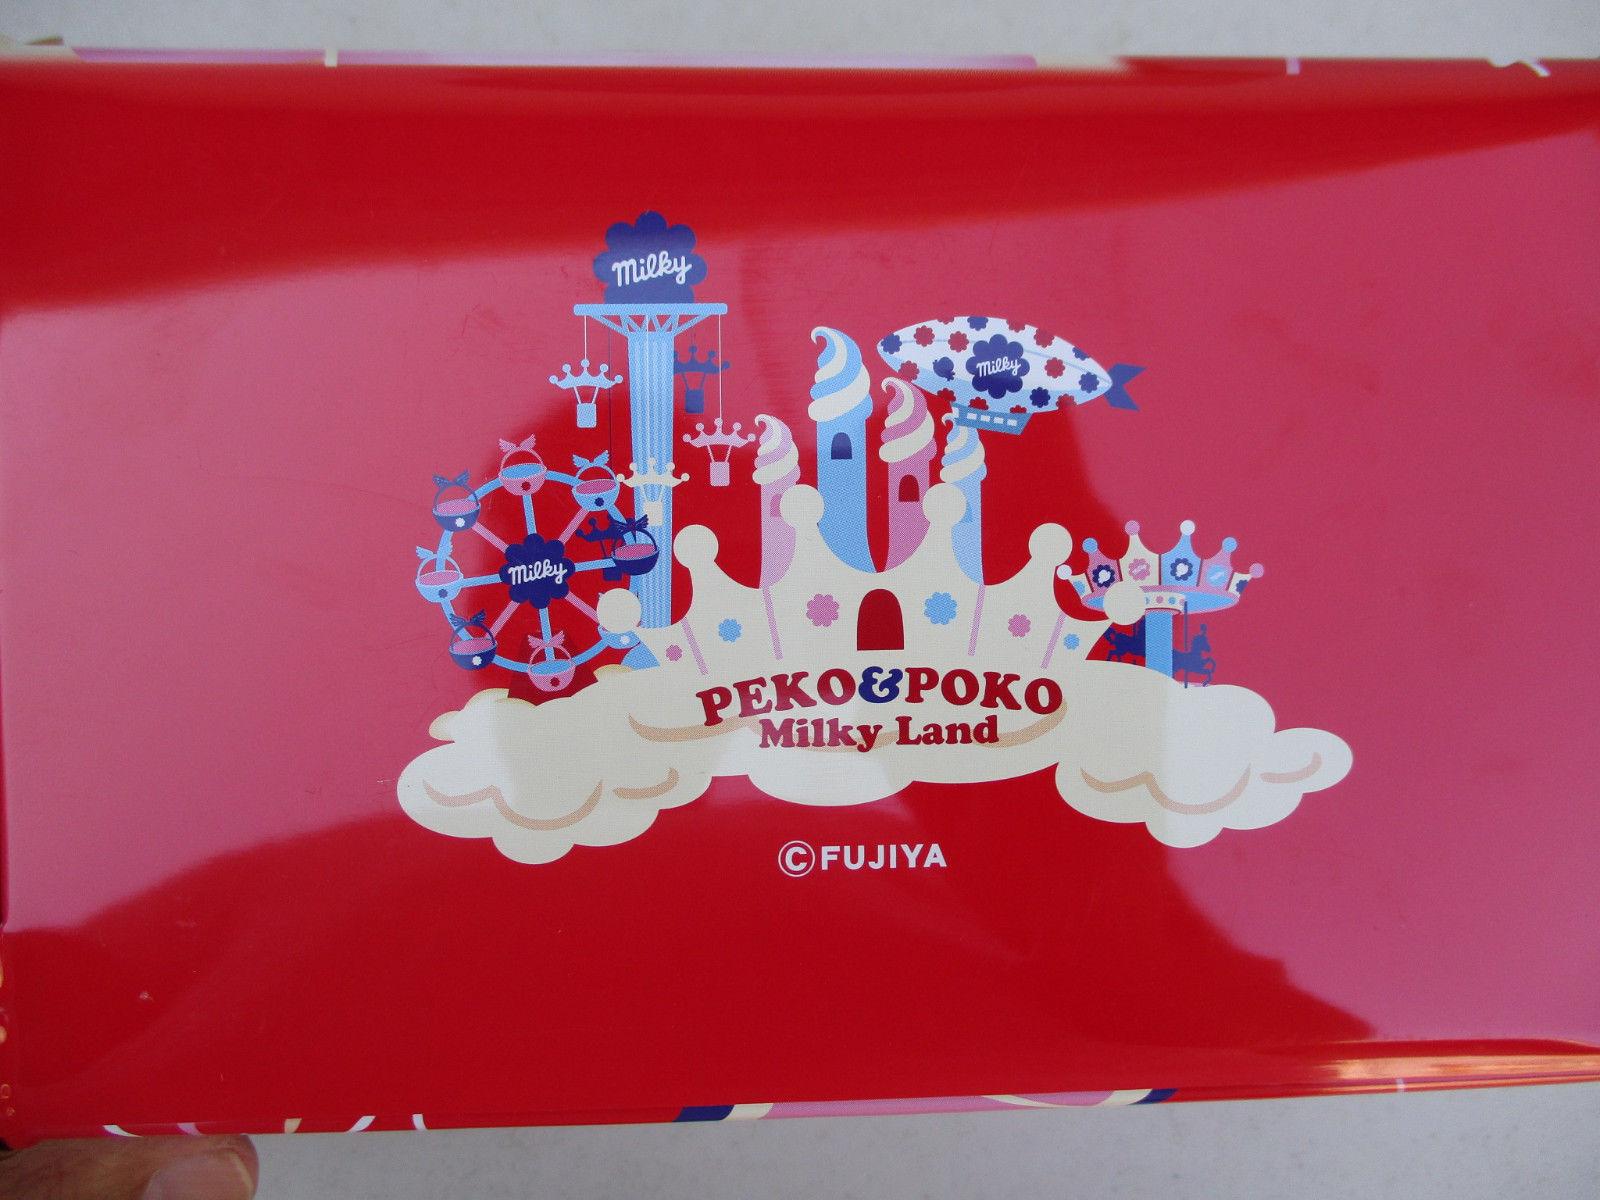 Japanese Lunch Box Peko & Poko Advertising Figures Candy Company Metal Fujiya